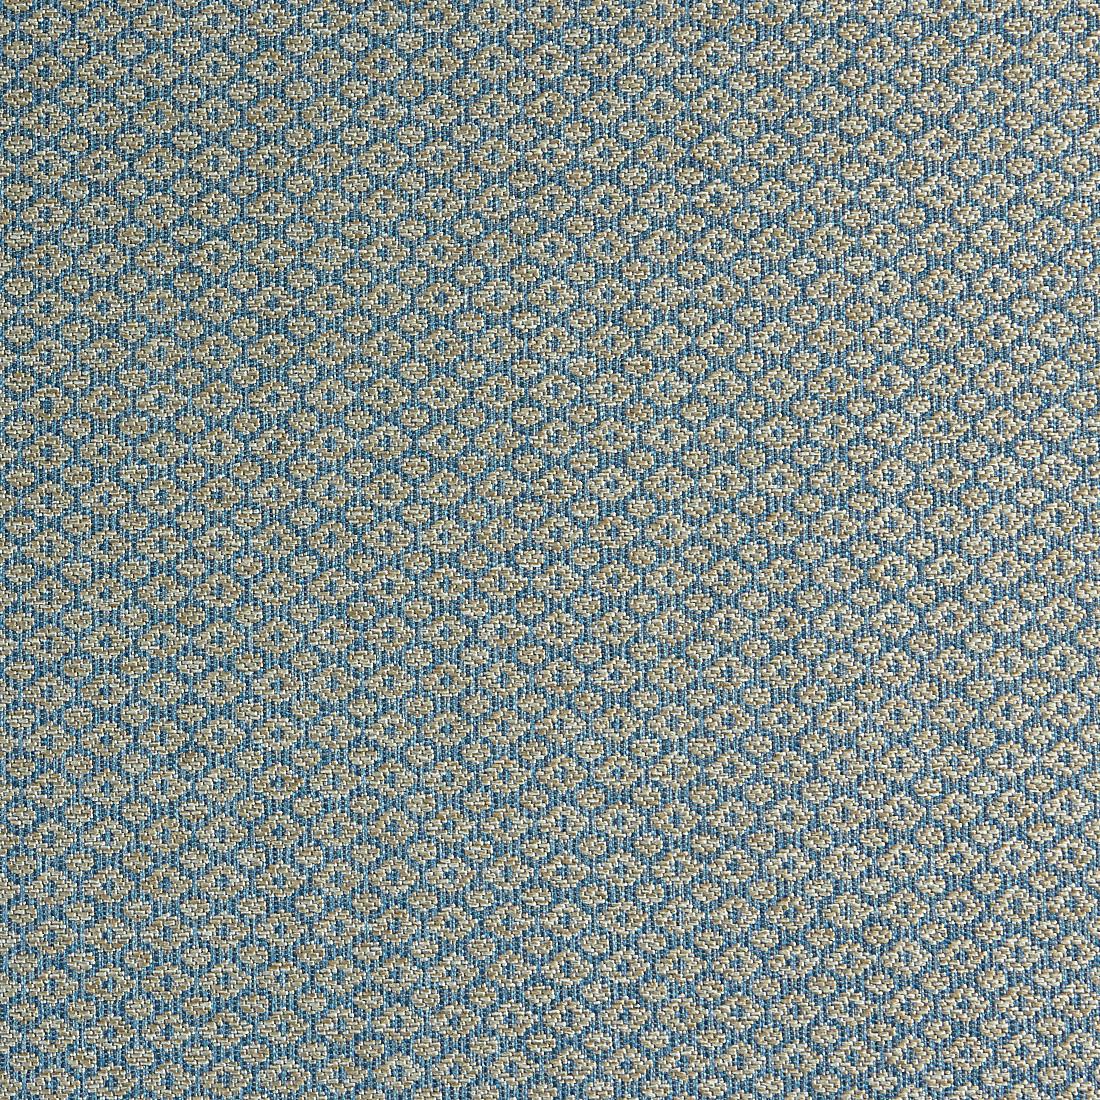 Hardwick Denim Upholstery Fabric